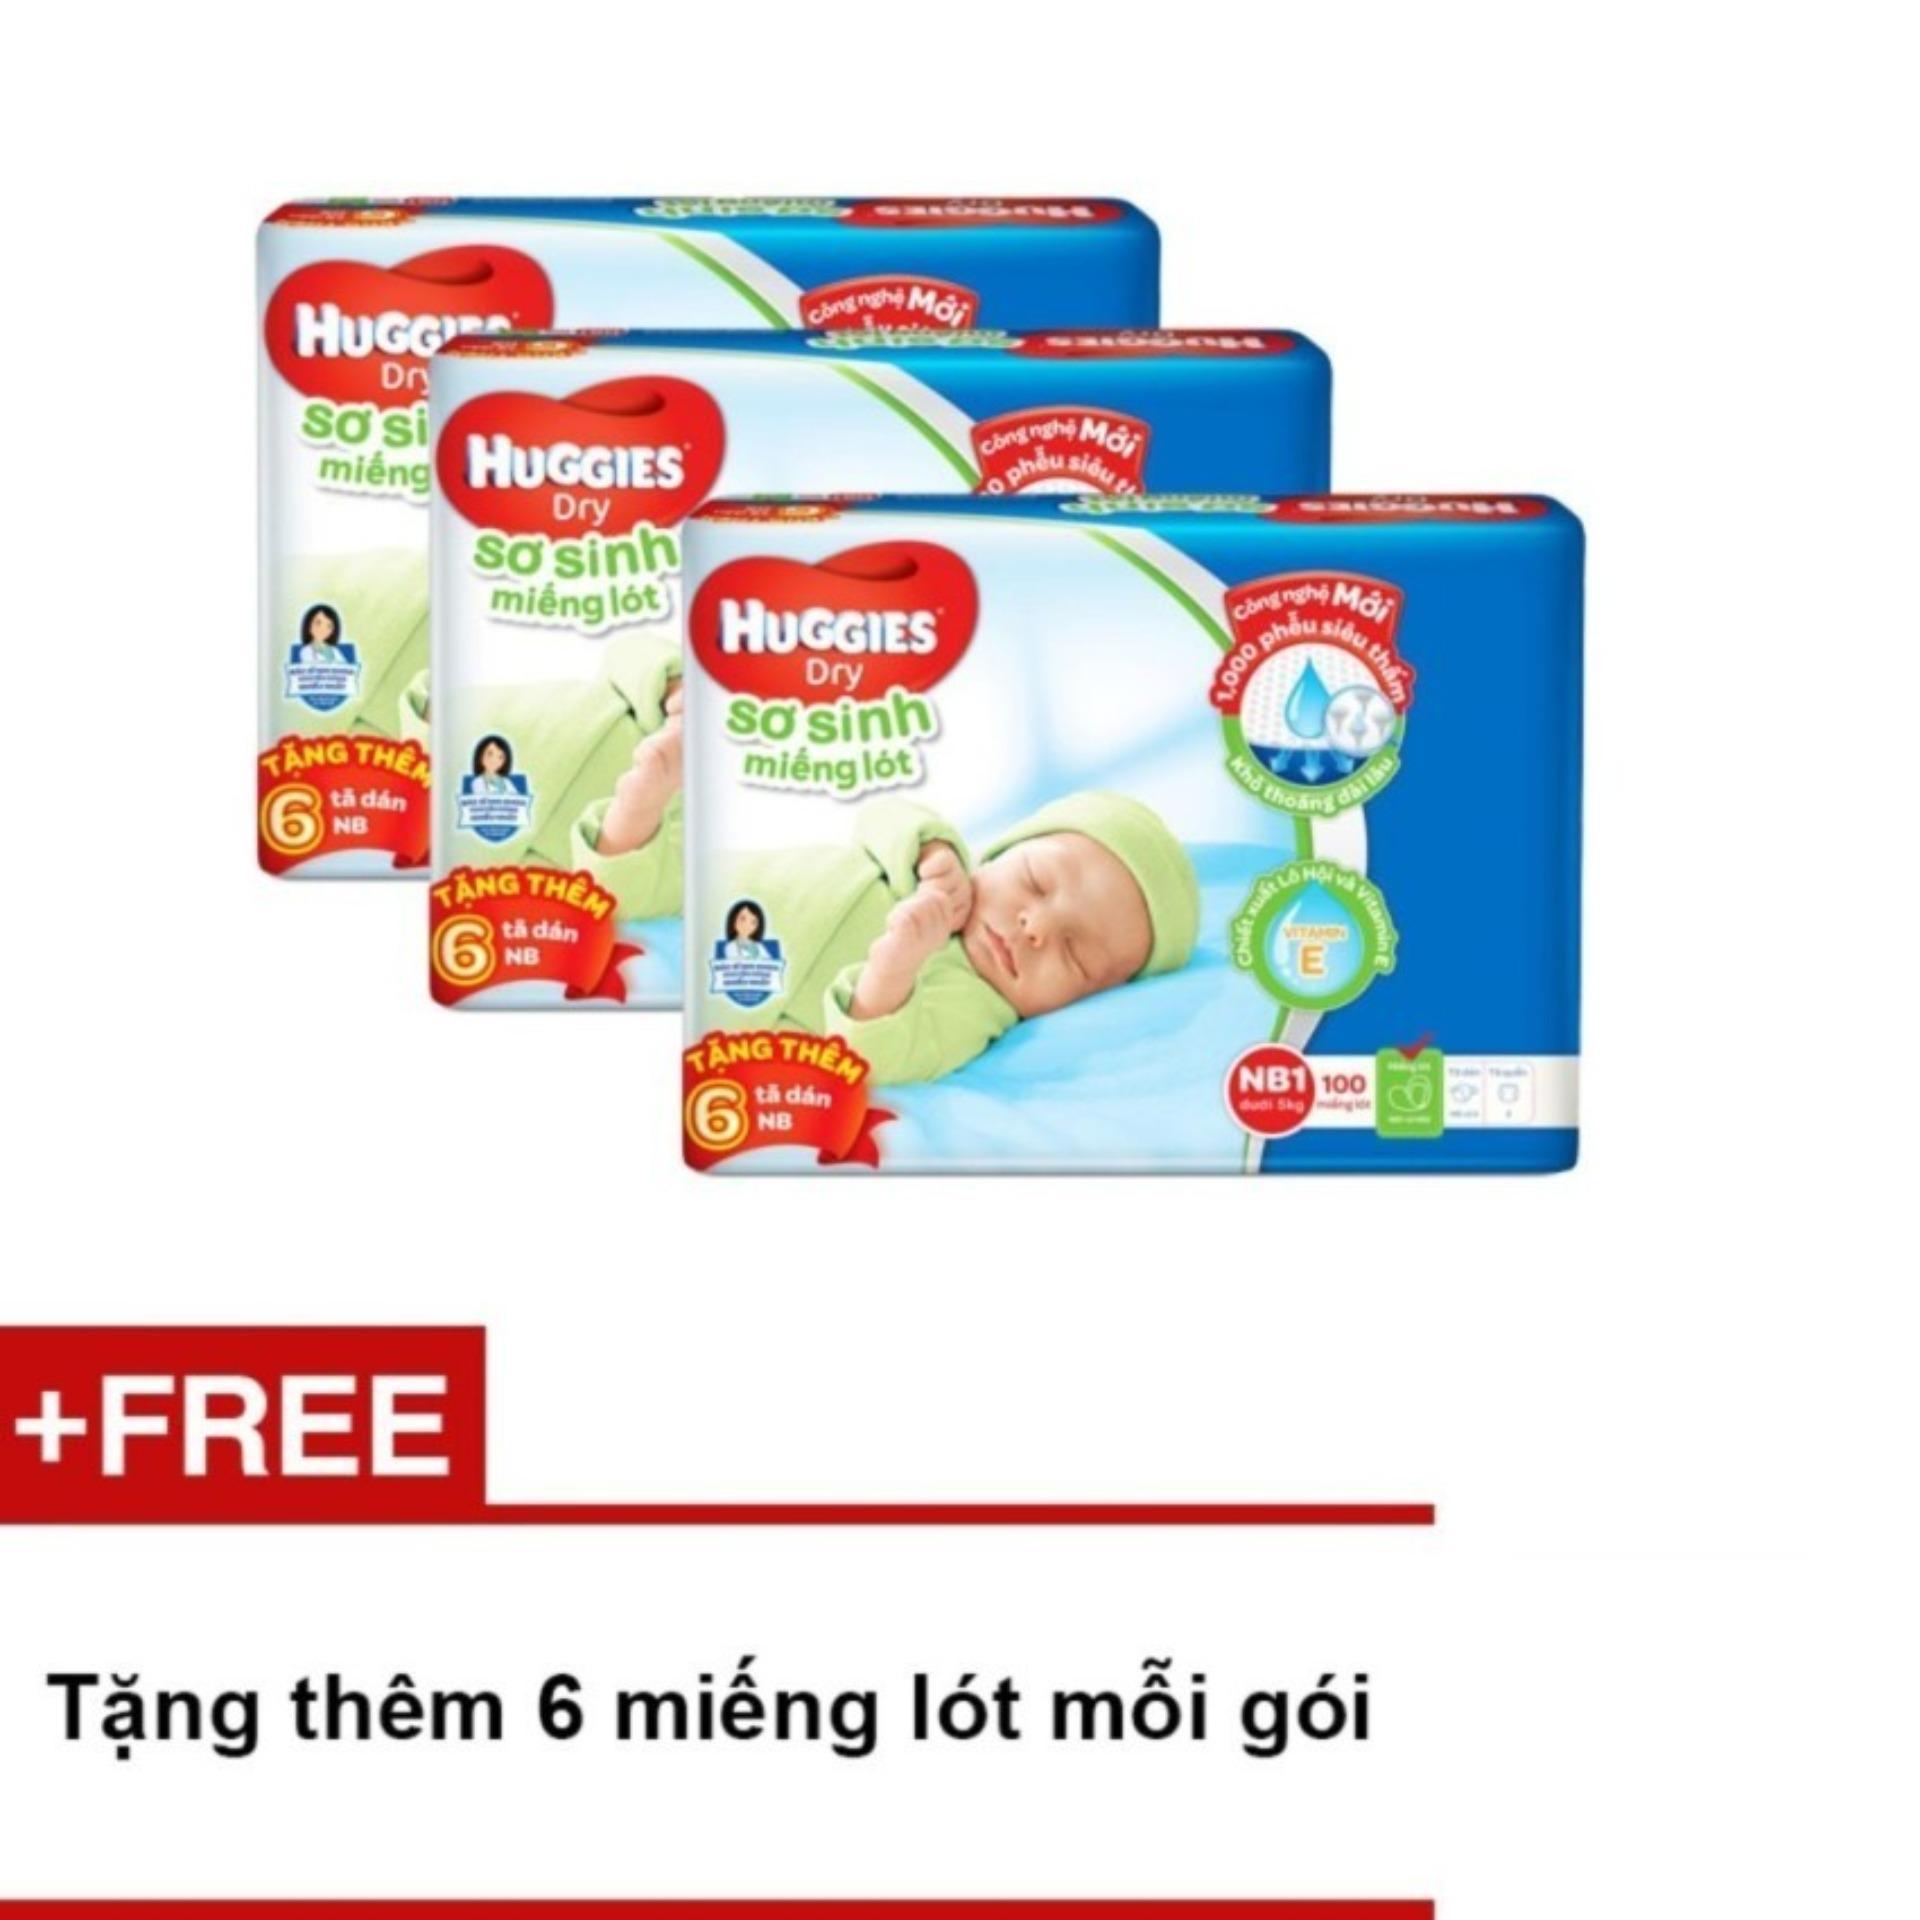 Chiết Khấu Bộ 3 Miếng Lot Sơ Sinh Huggies Newborn 1 5Kg N100 Goi 100 Miếng Tặng Them 6 Miếng Lot Mỗi Goi Vietnam